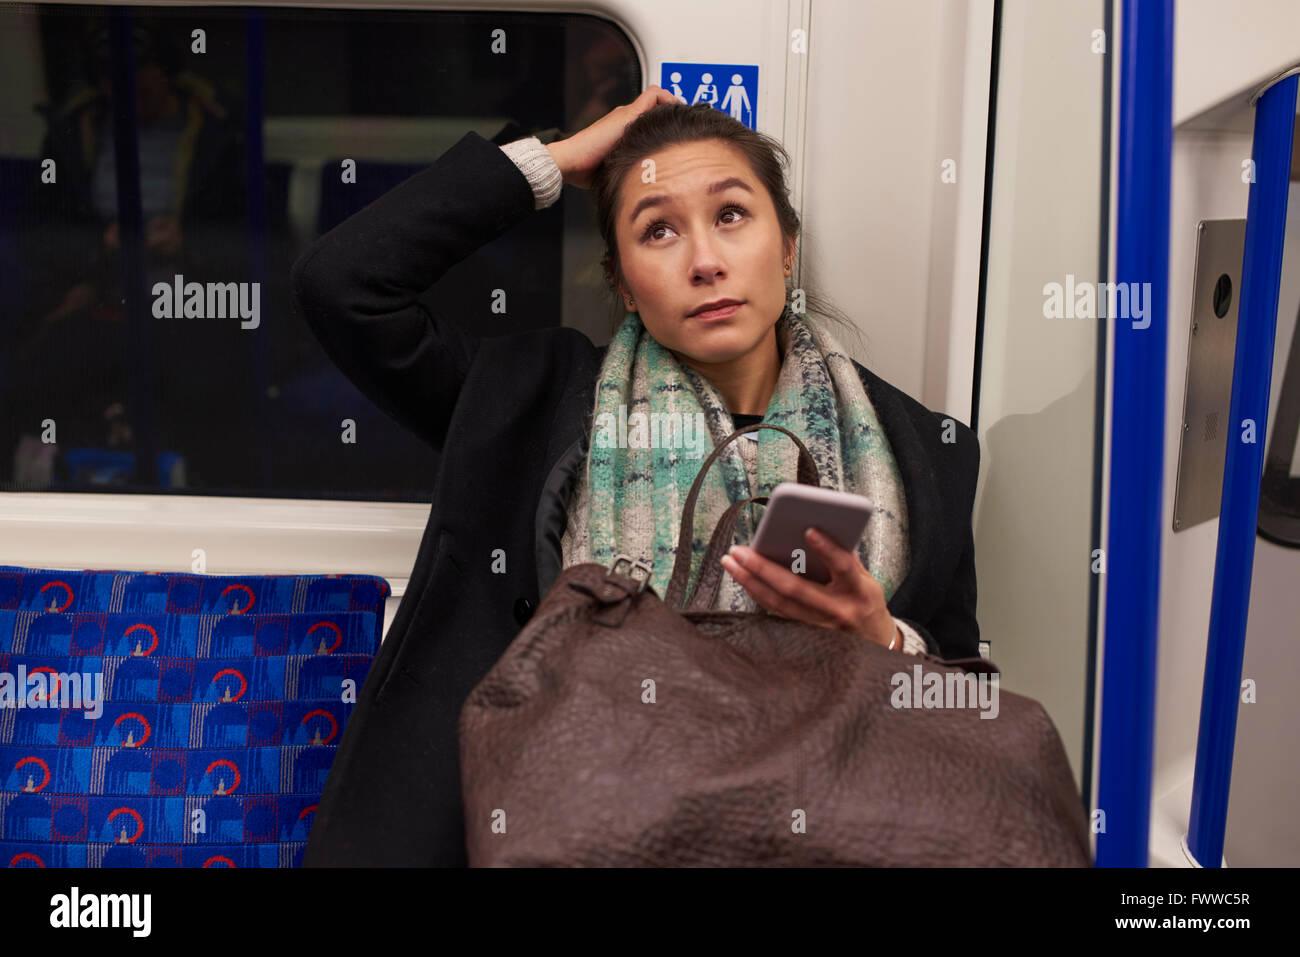 Mujer sentada en carro de Metro buscando en mensaje de texto Imagen De Stock